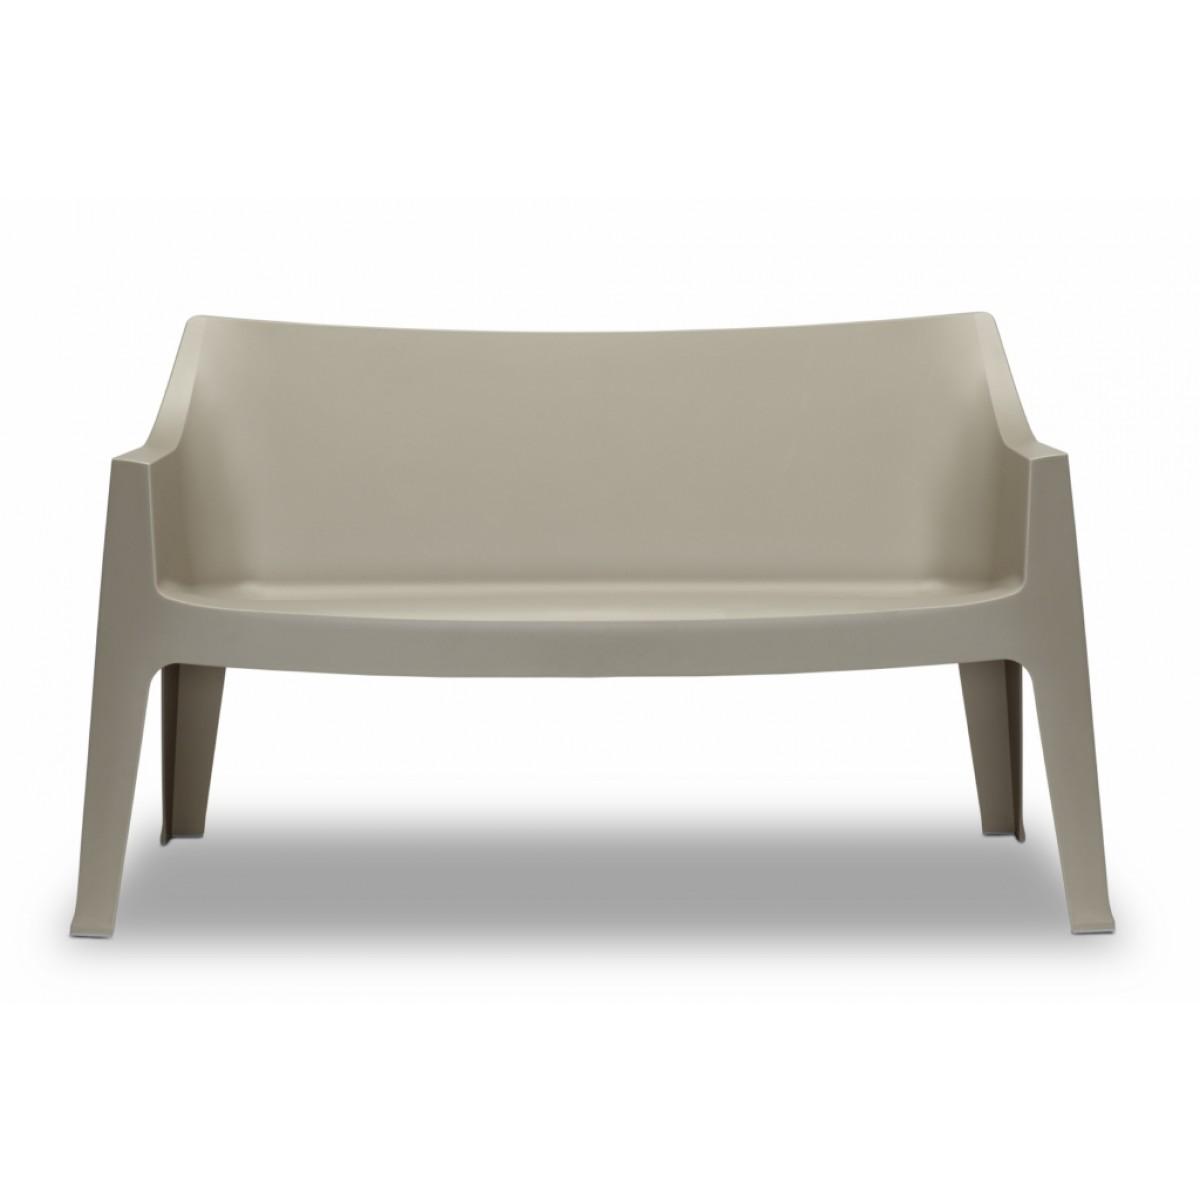 Design Bank Kunststoff grau Outdoor geeignet